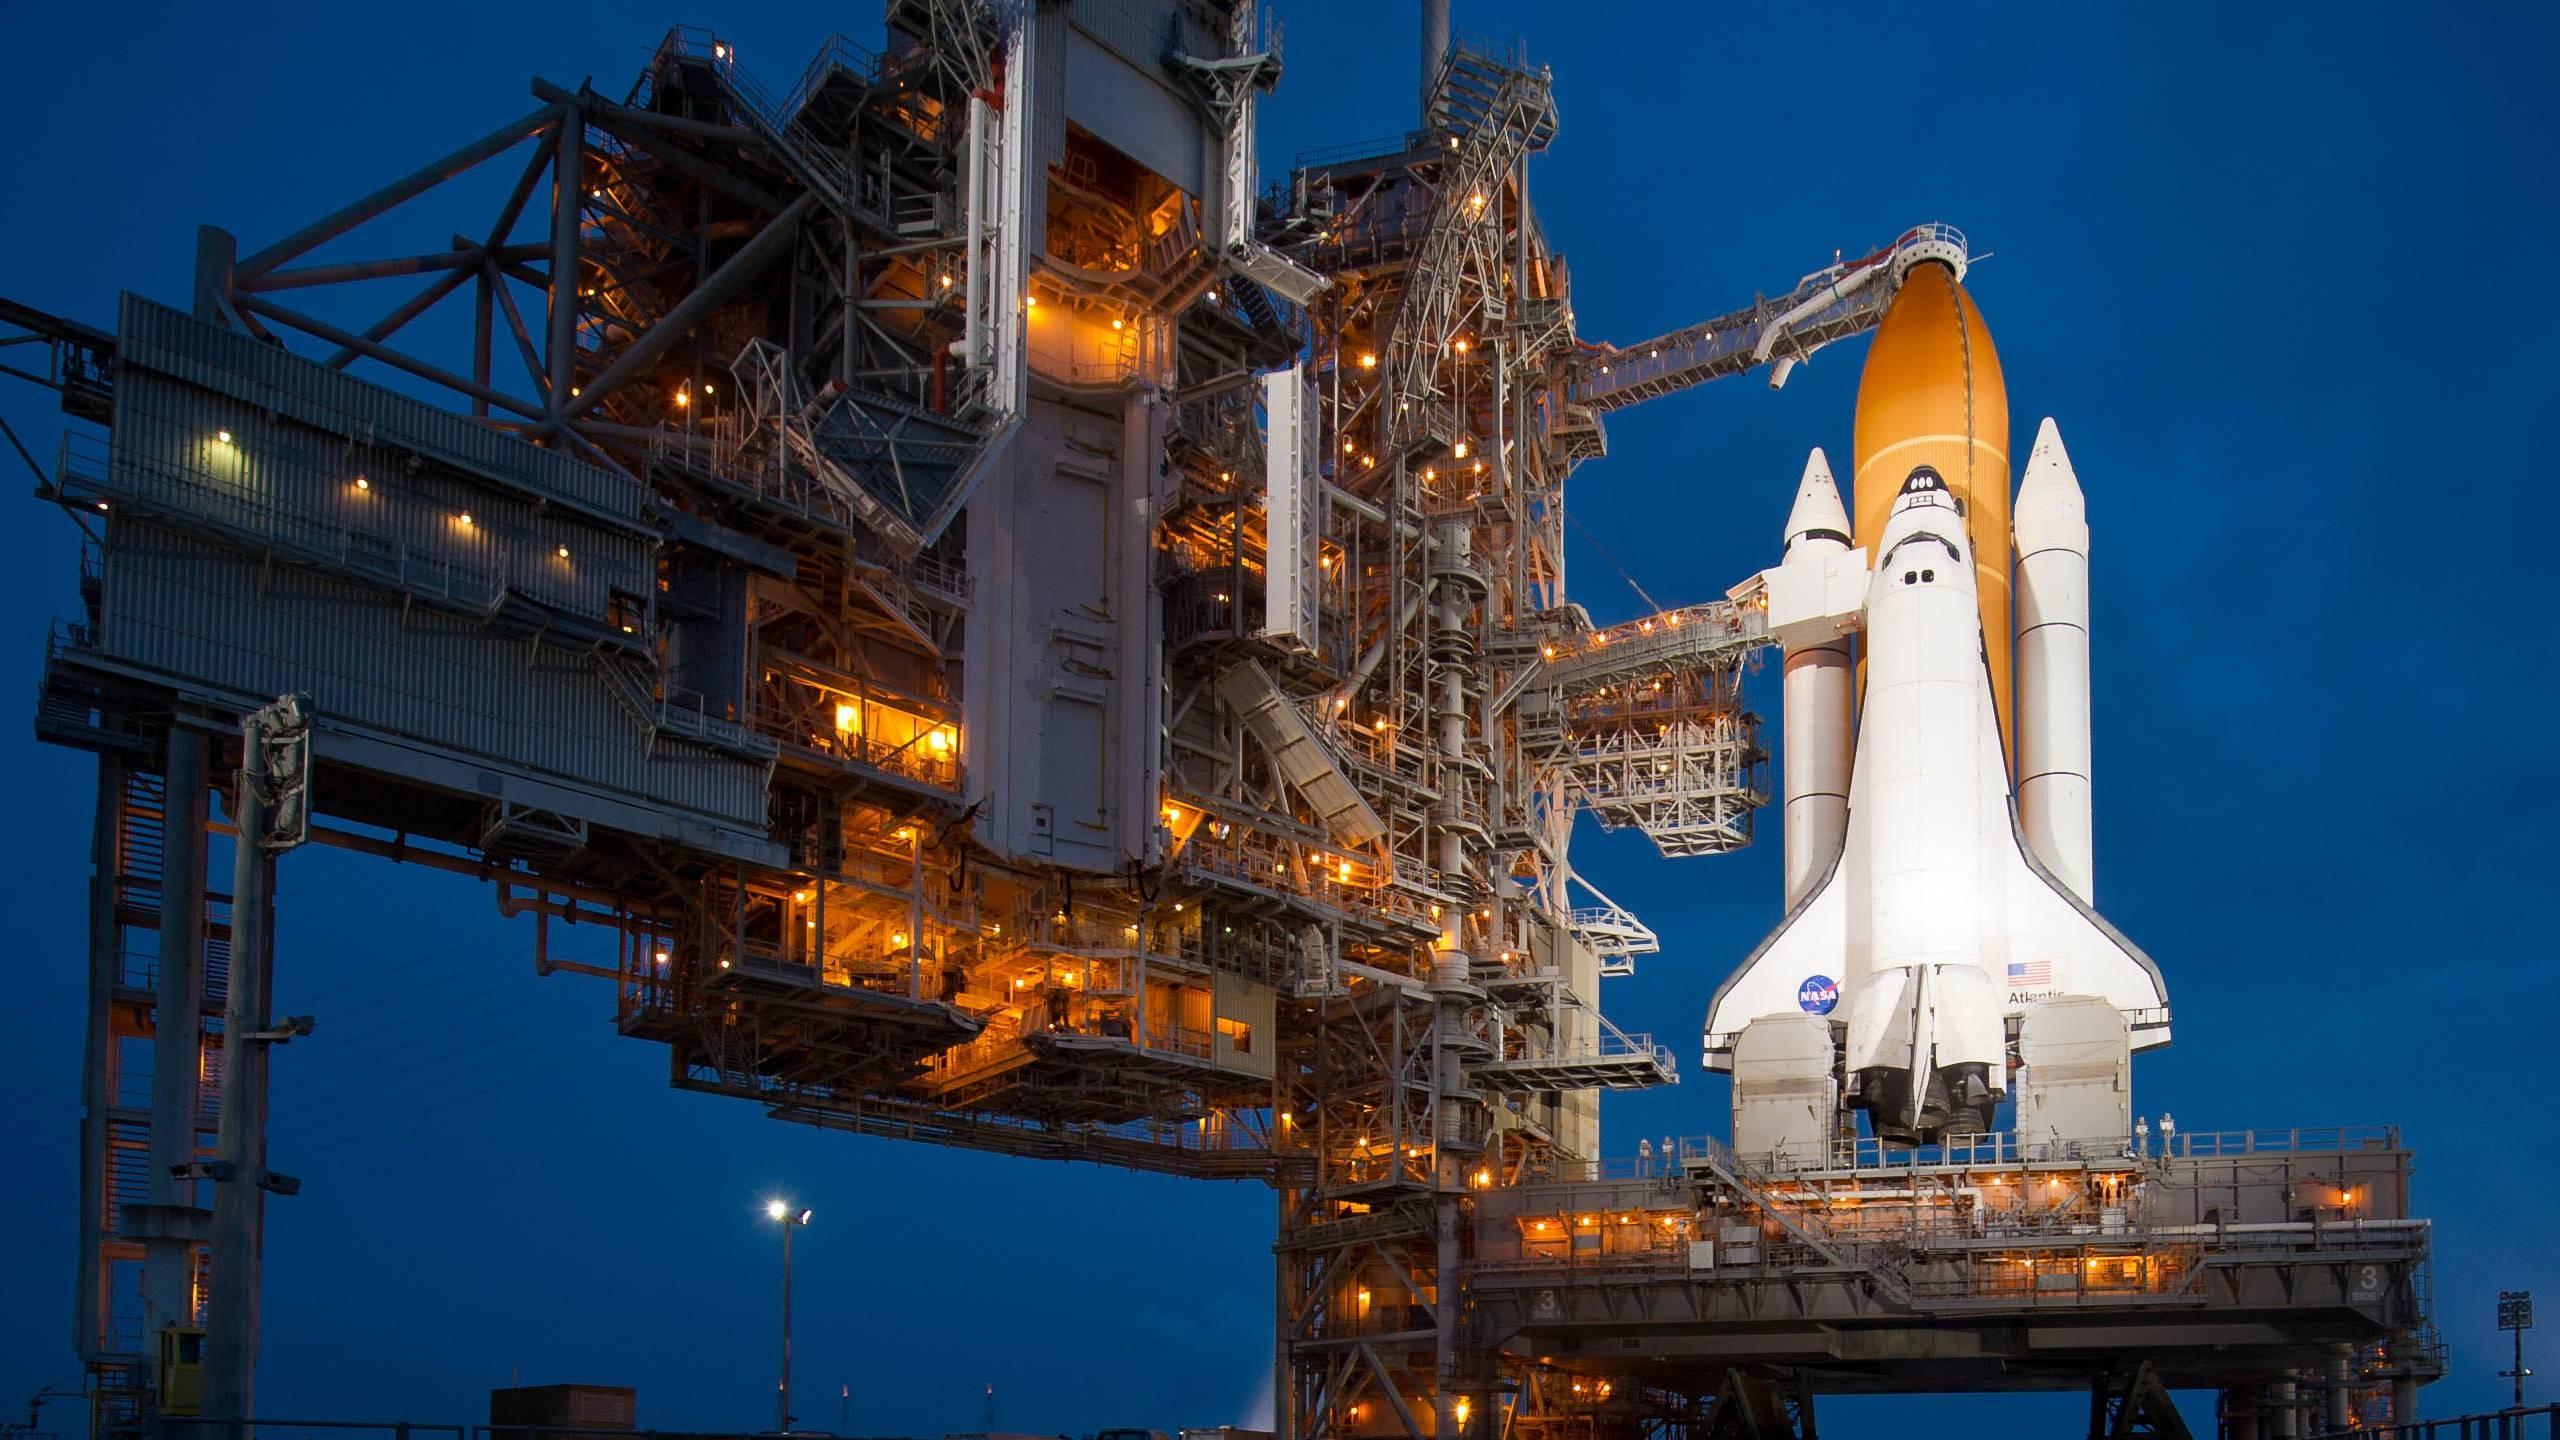 Space Shuttle Wallpaper - Space Shuttle Program , HD Wallpaper & Backgrounds